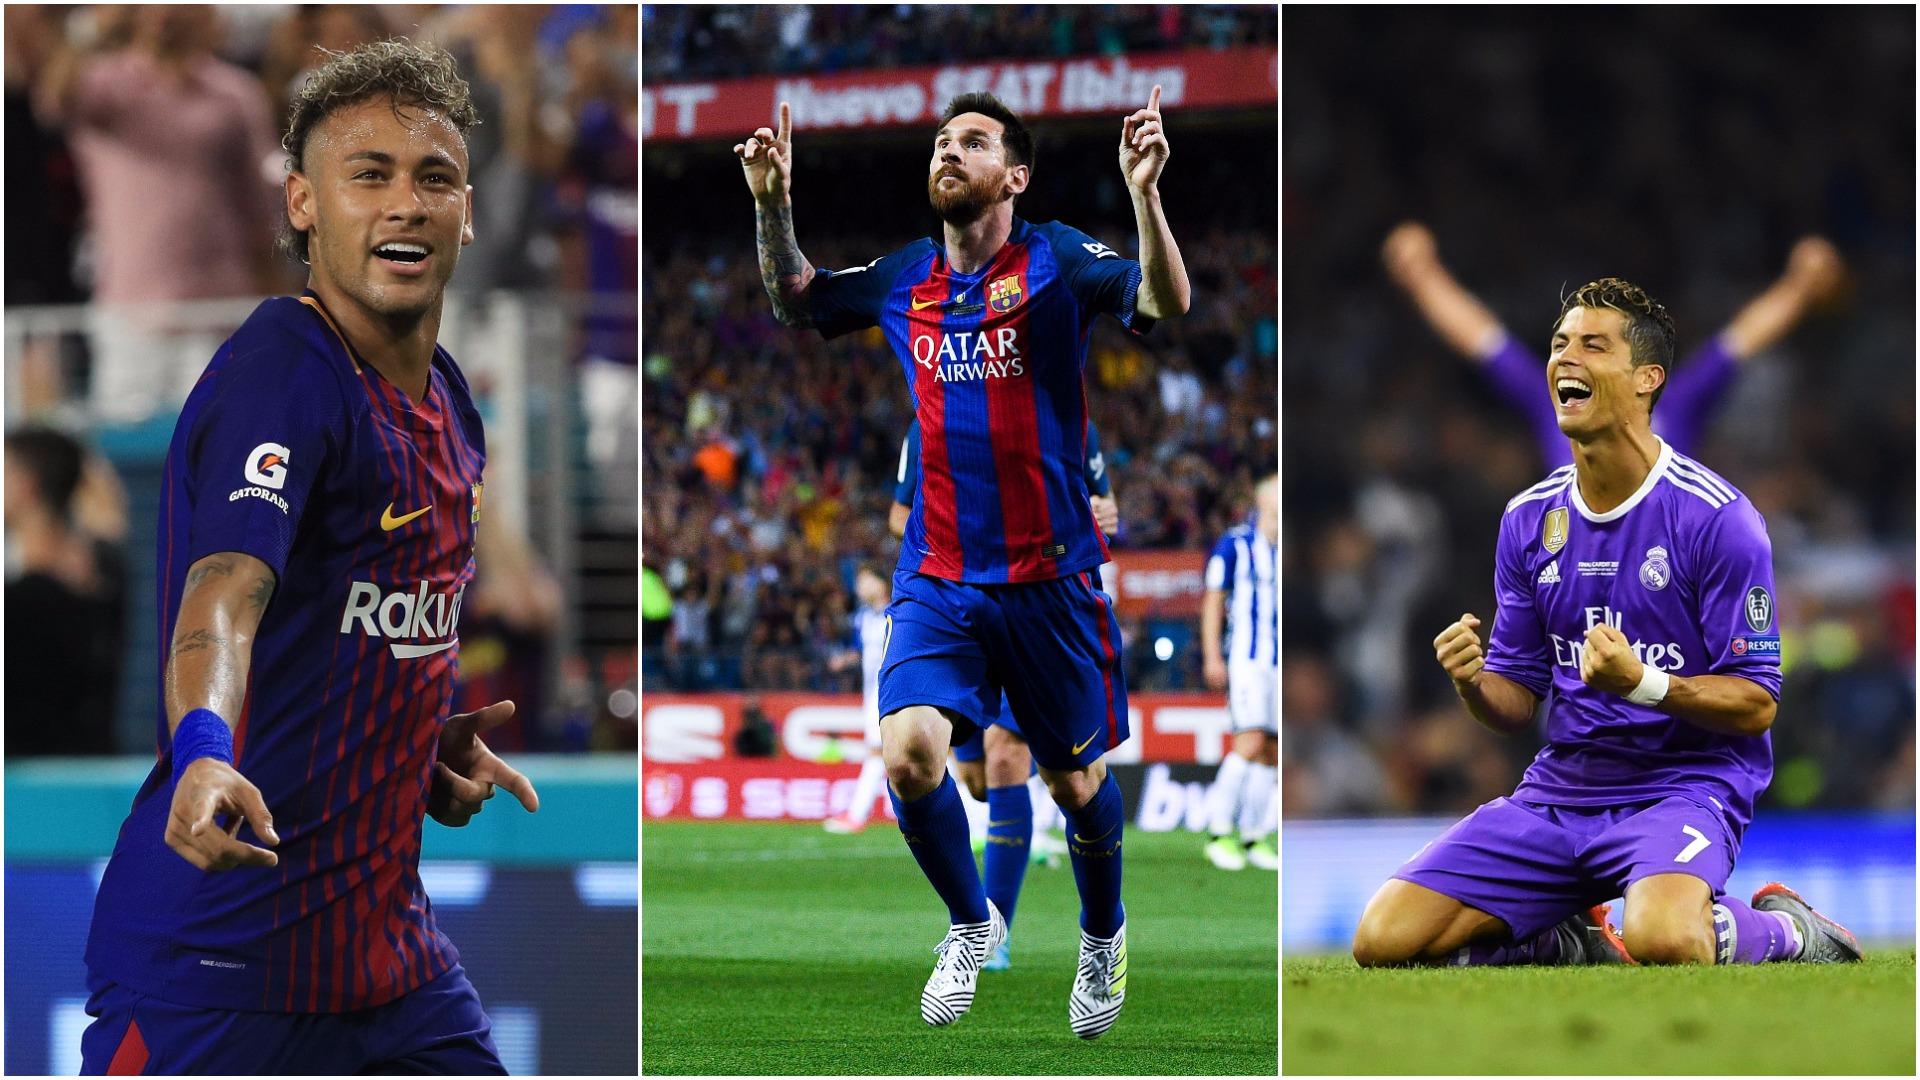 Talismanic Messi Ronaldo Way Ahead Of Psg New Boy Neymar